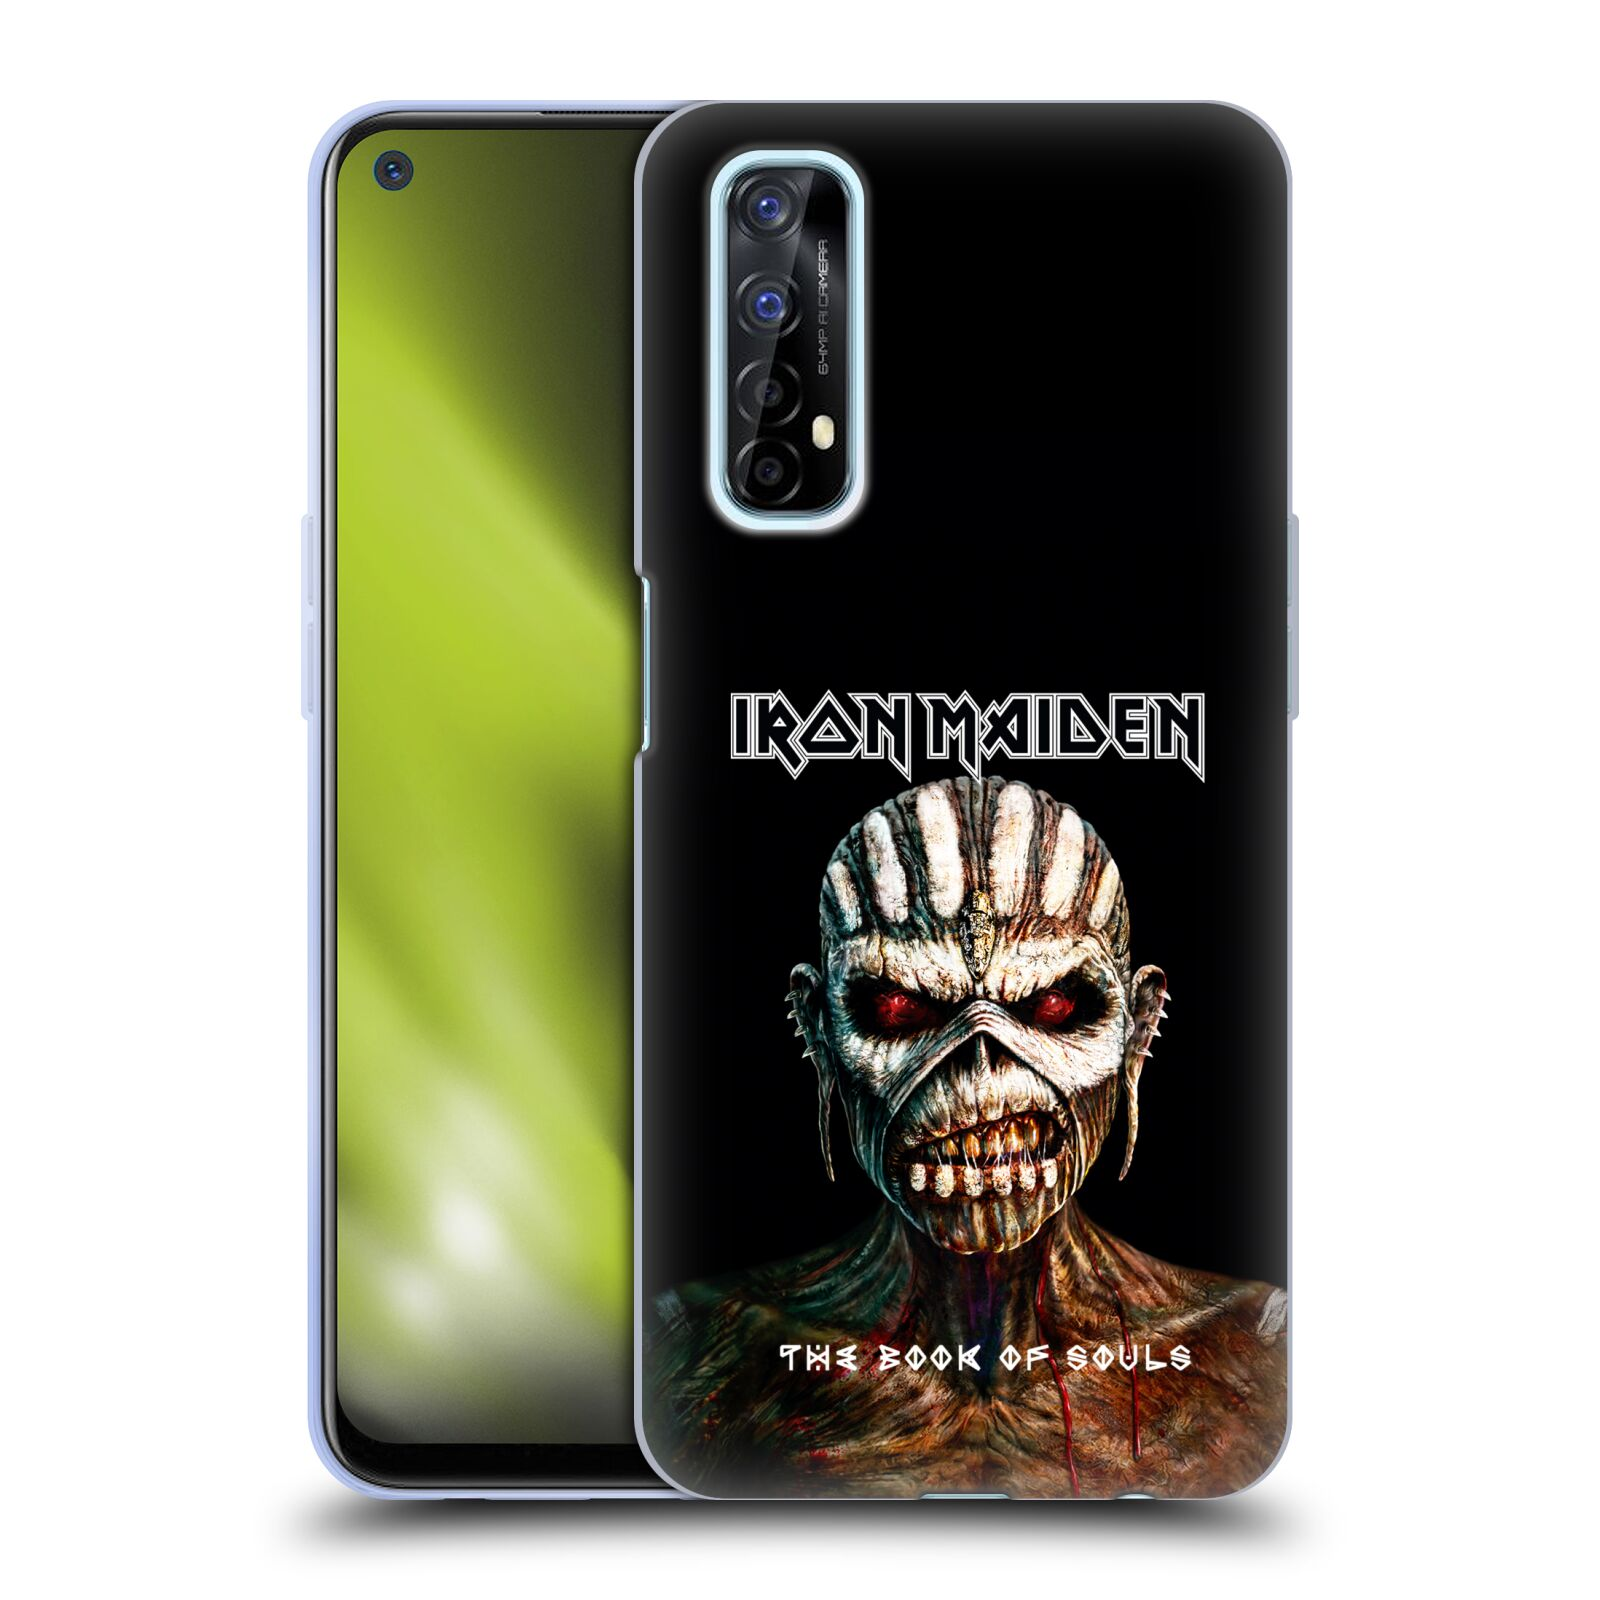 Silikonové pouzdro na mobil Realme 7 - Head Case - Iron Maiden - The Book Of Souls